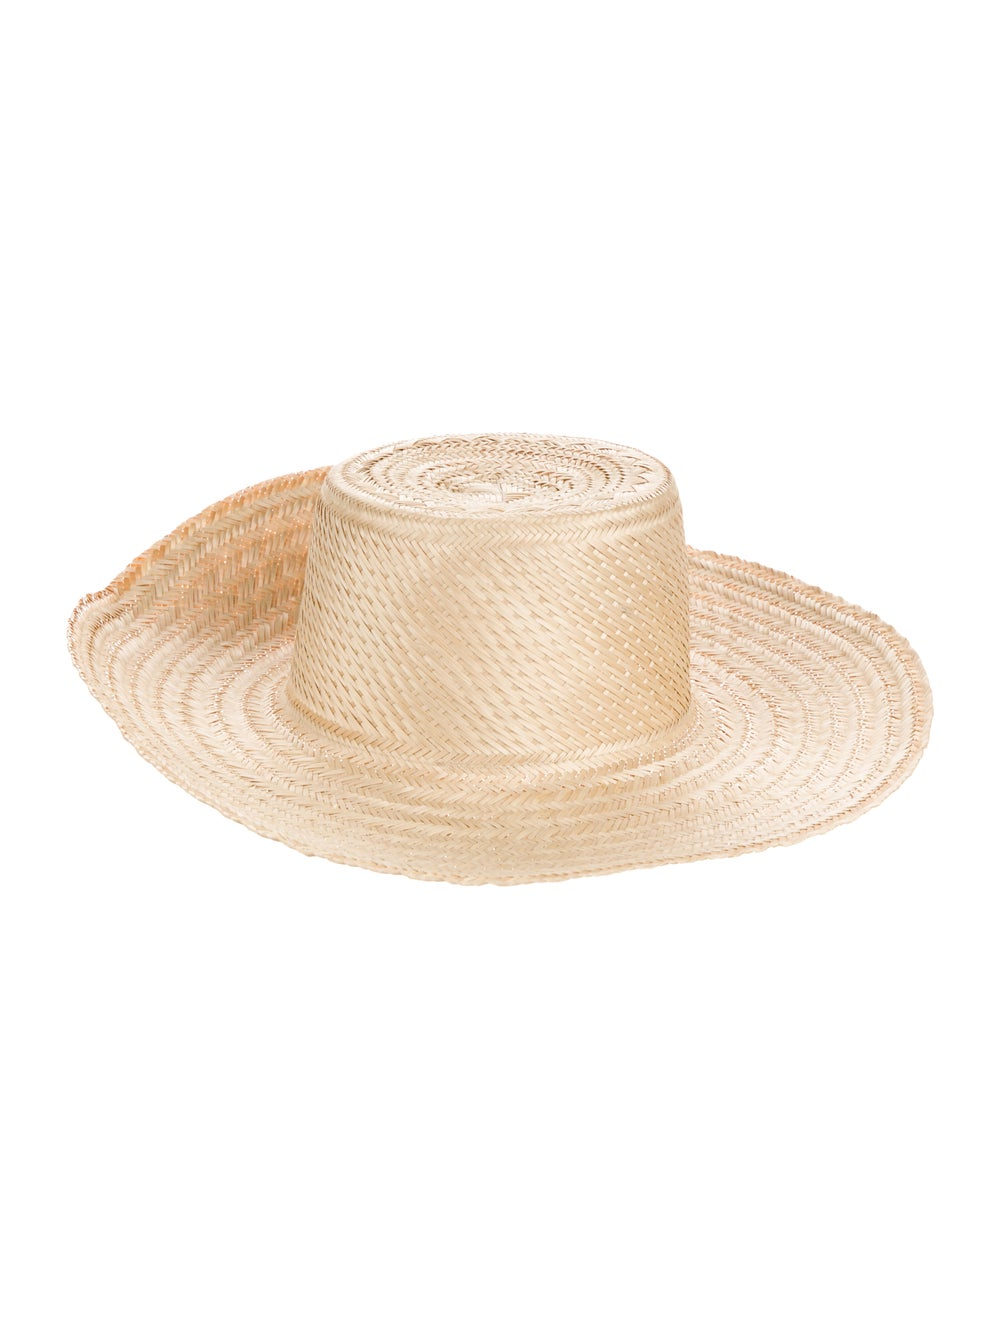 Janessa Leone Straw Hat Tan - image 1